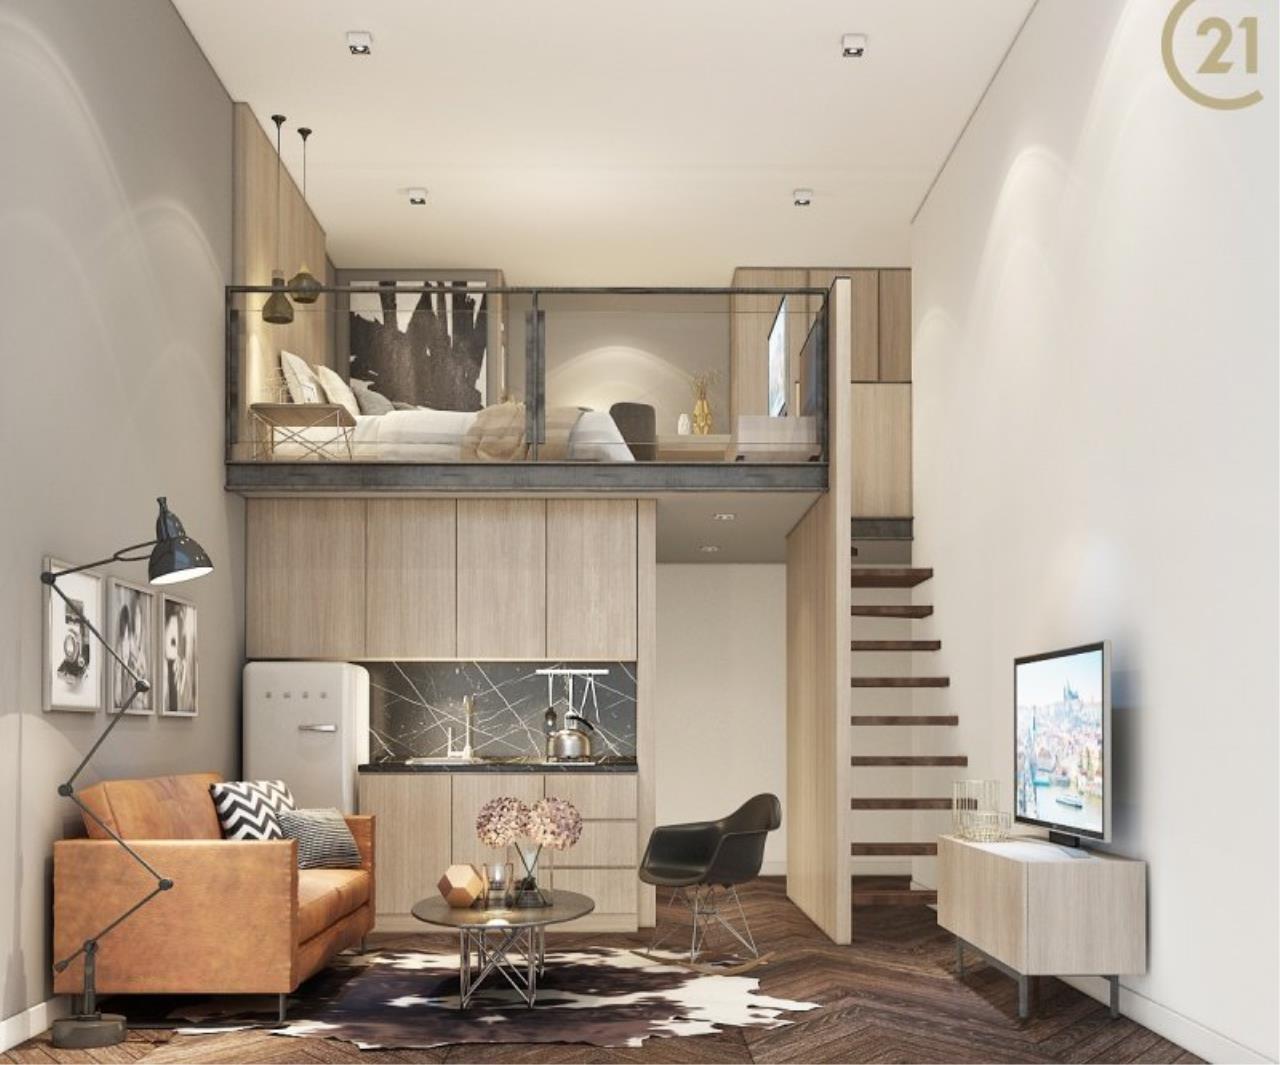 Century21 Skylux Agency's Siamese Sukhumvit / Condo For Sale / 1 Bedroom / 44.39 SQM / BTS On Nut / Bangkok 1